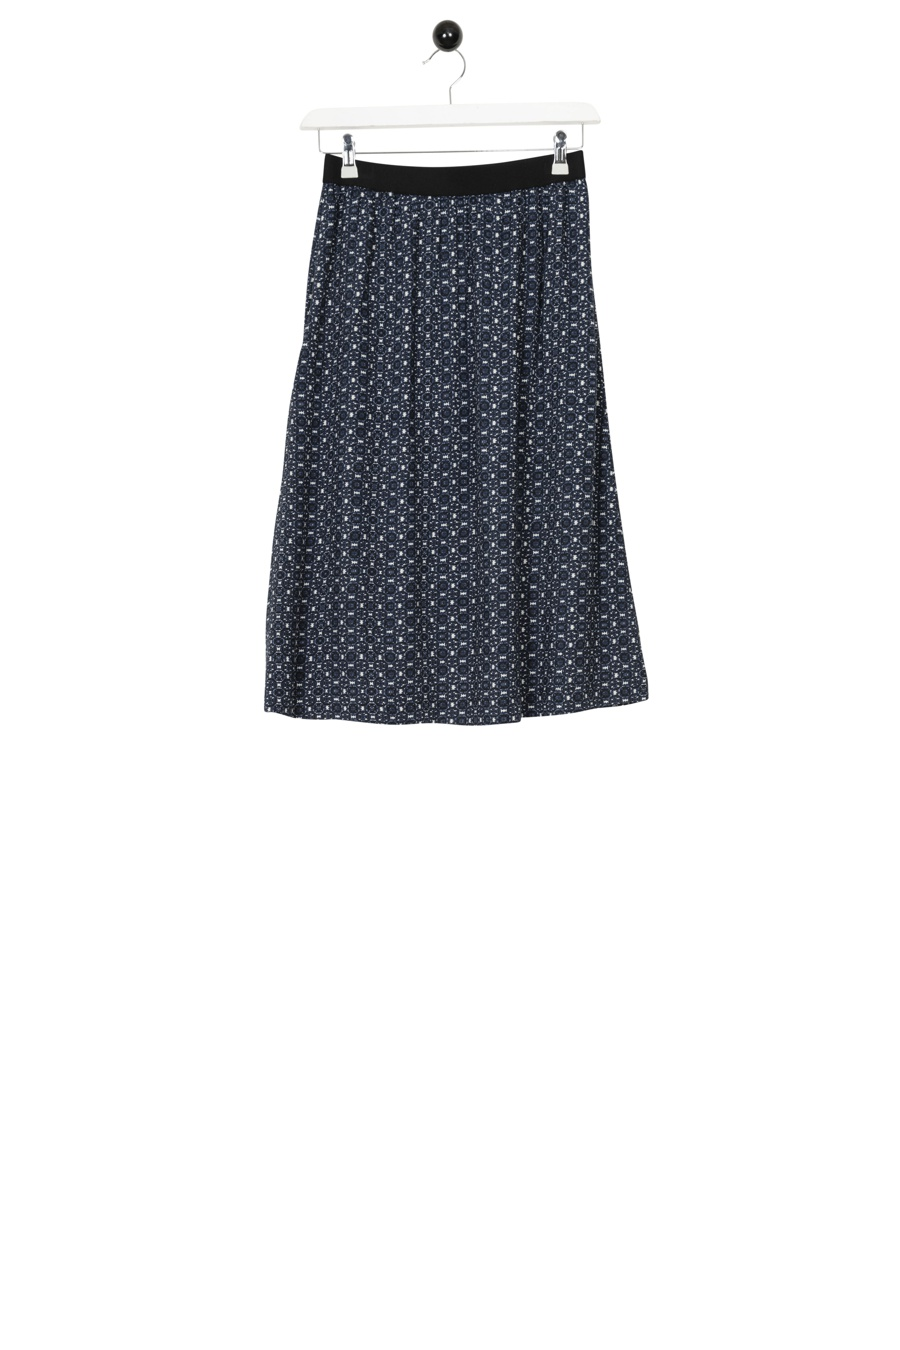 Perpignan Skirt